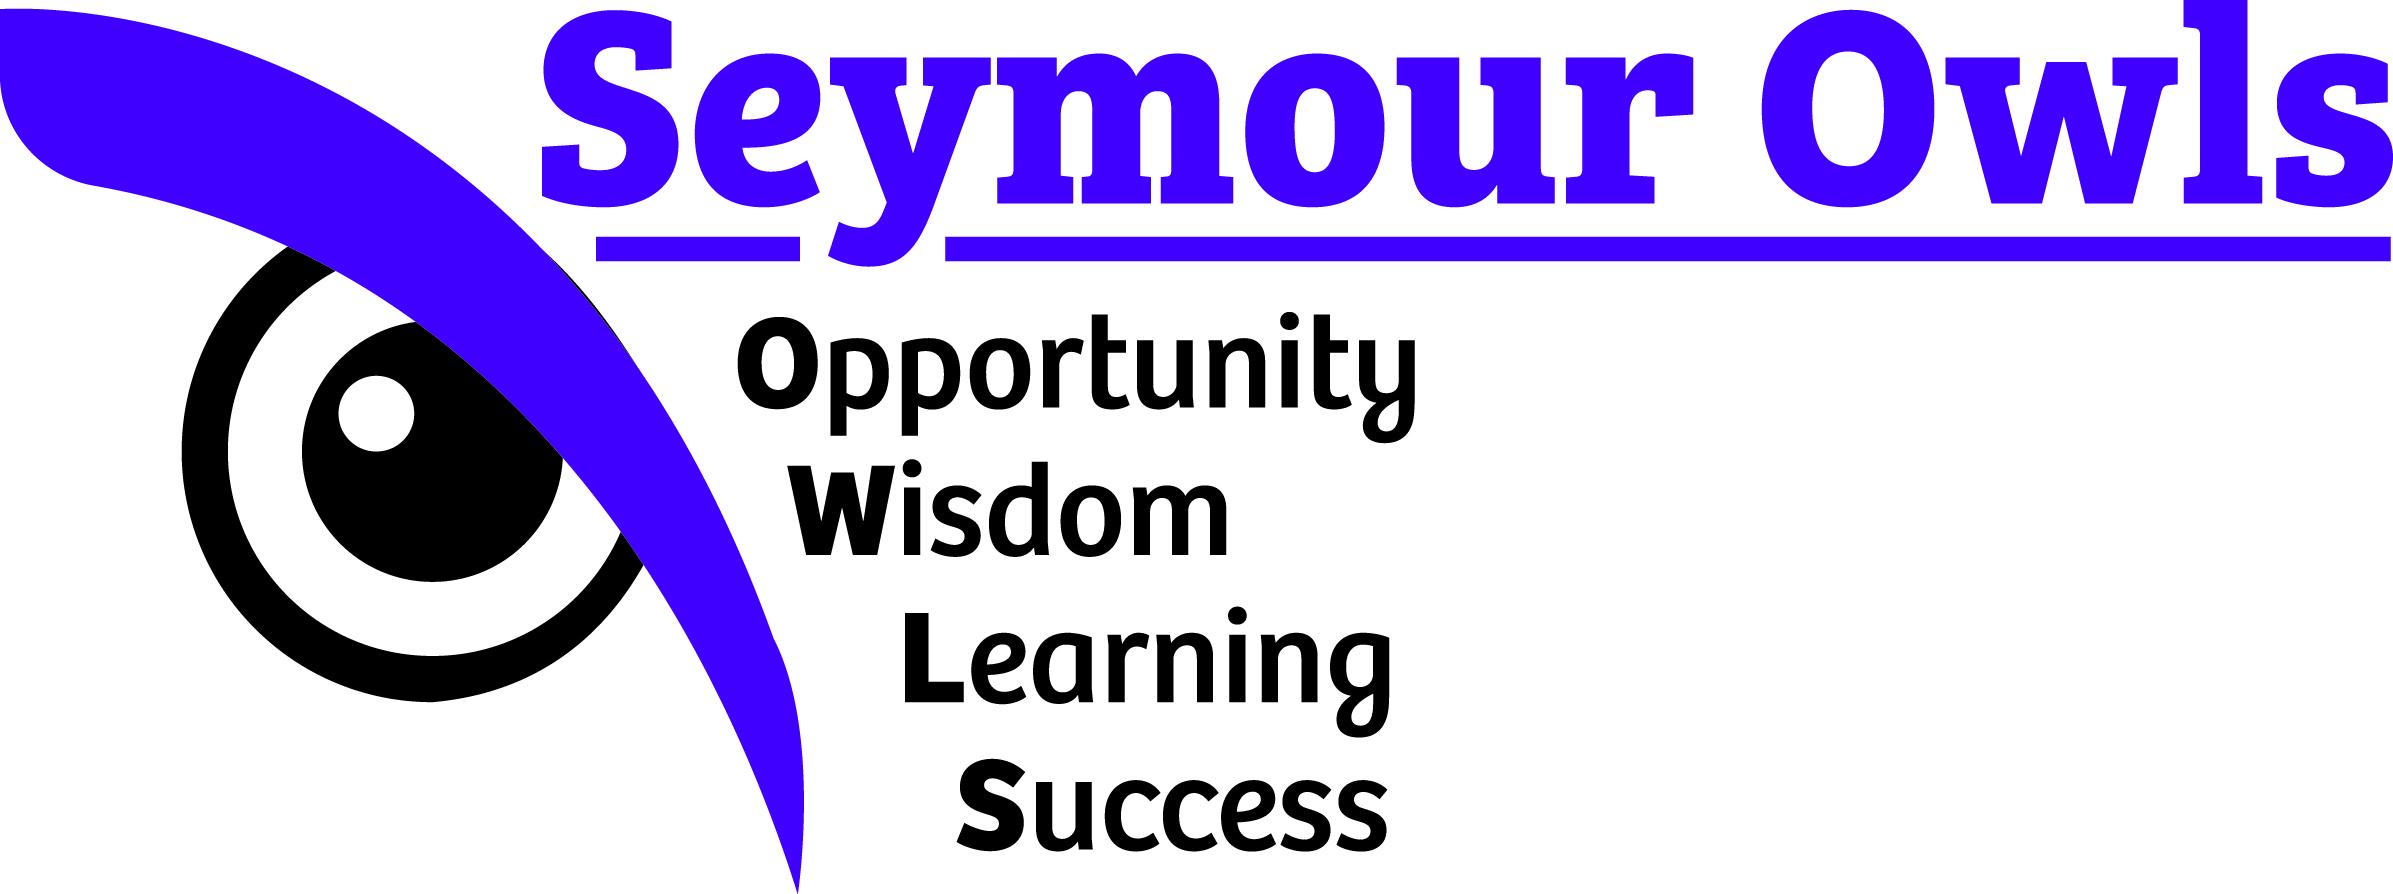 Seymour Owls